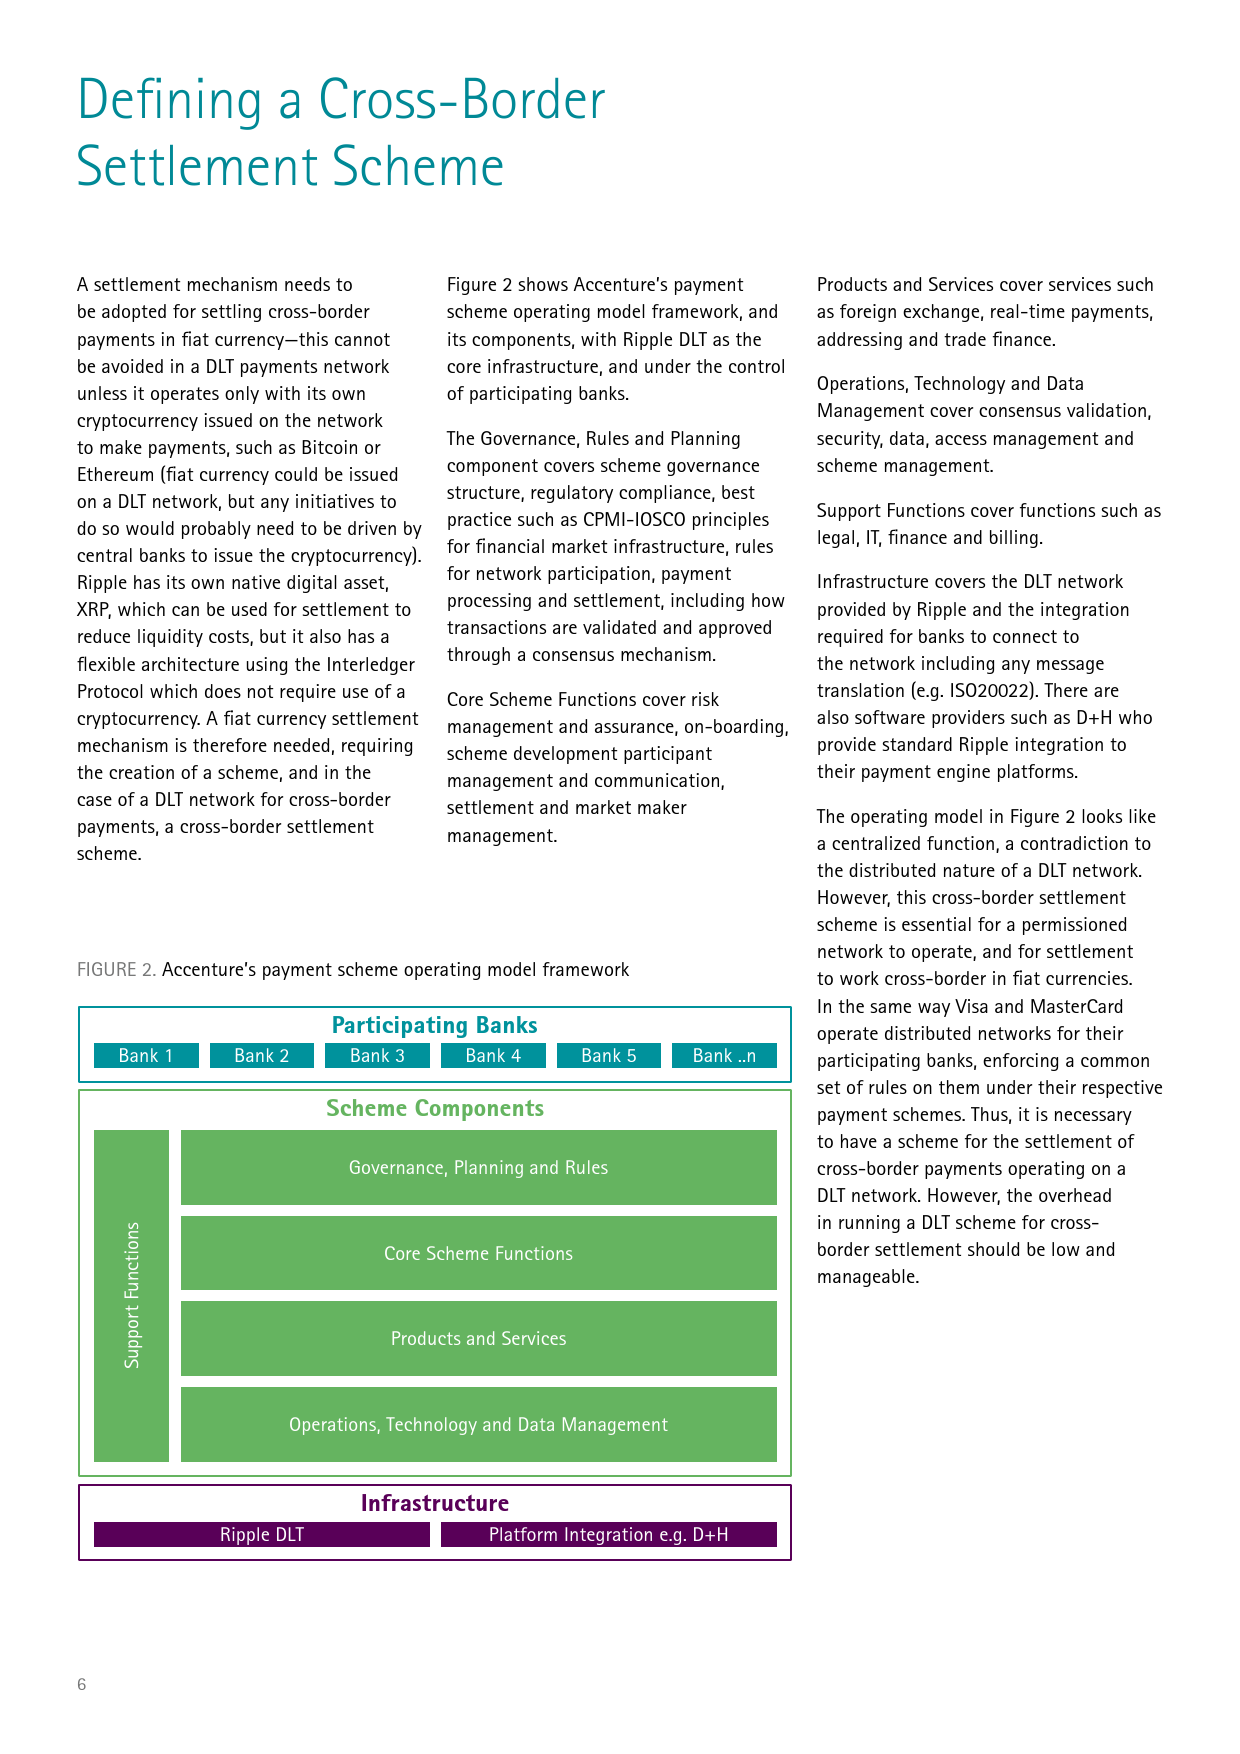 Accenture_Ripple_CrossBorderPayments_000006